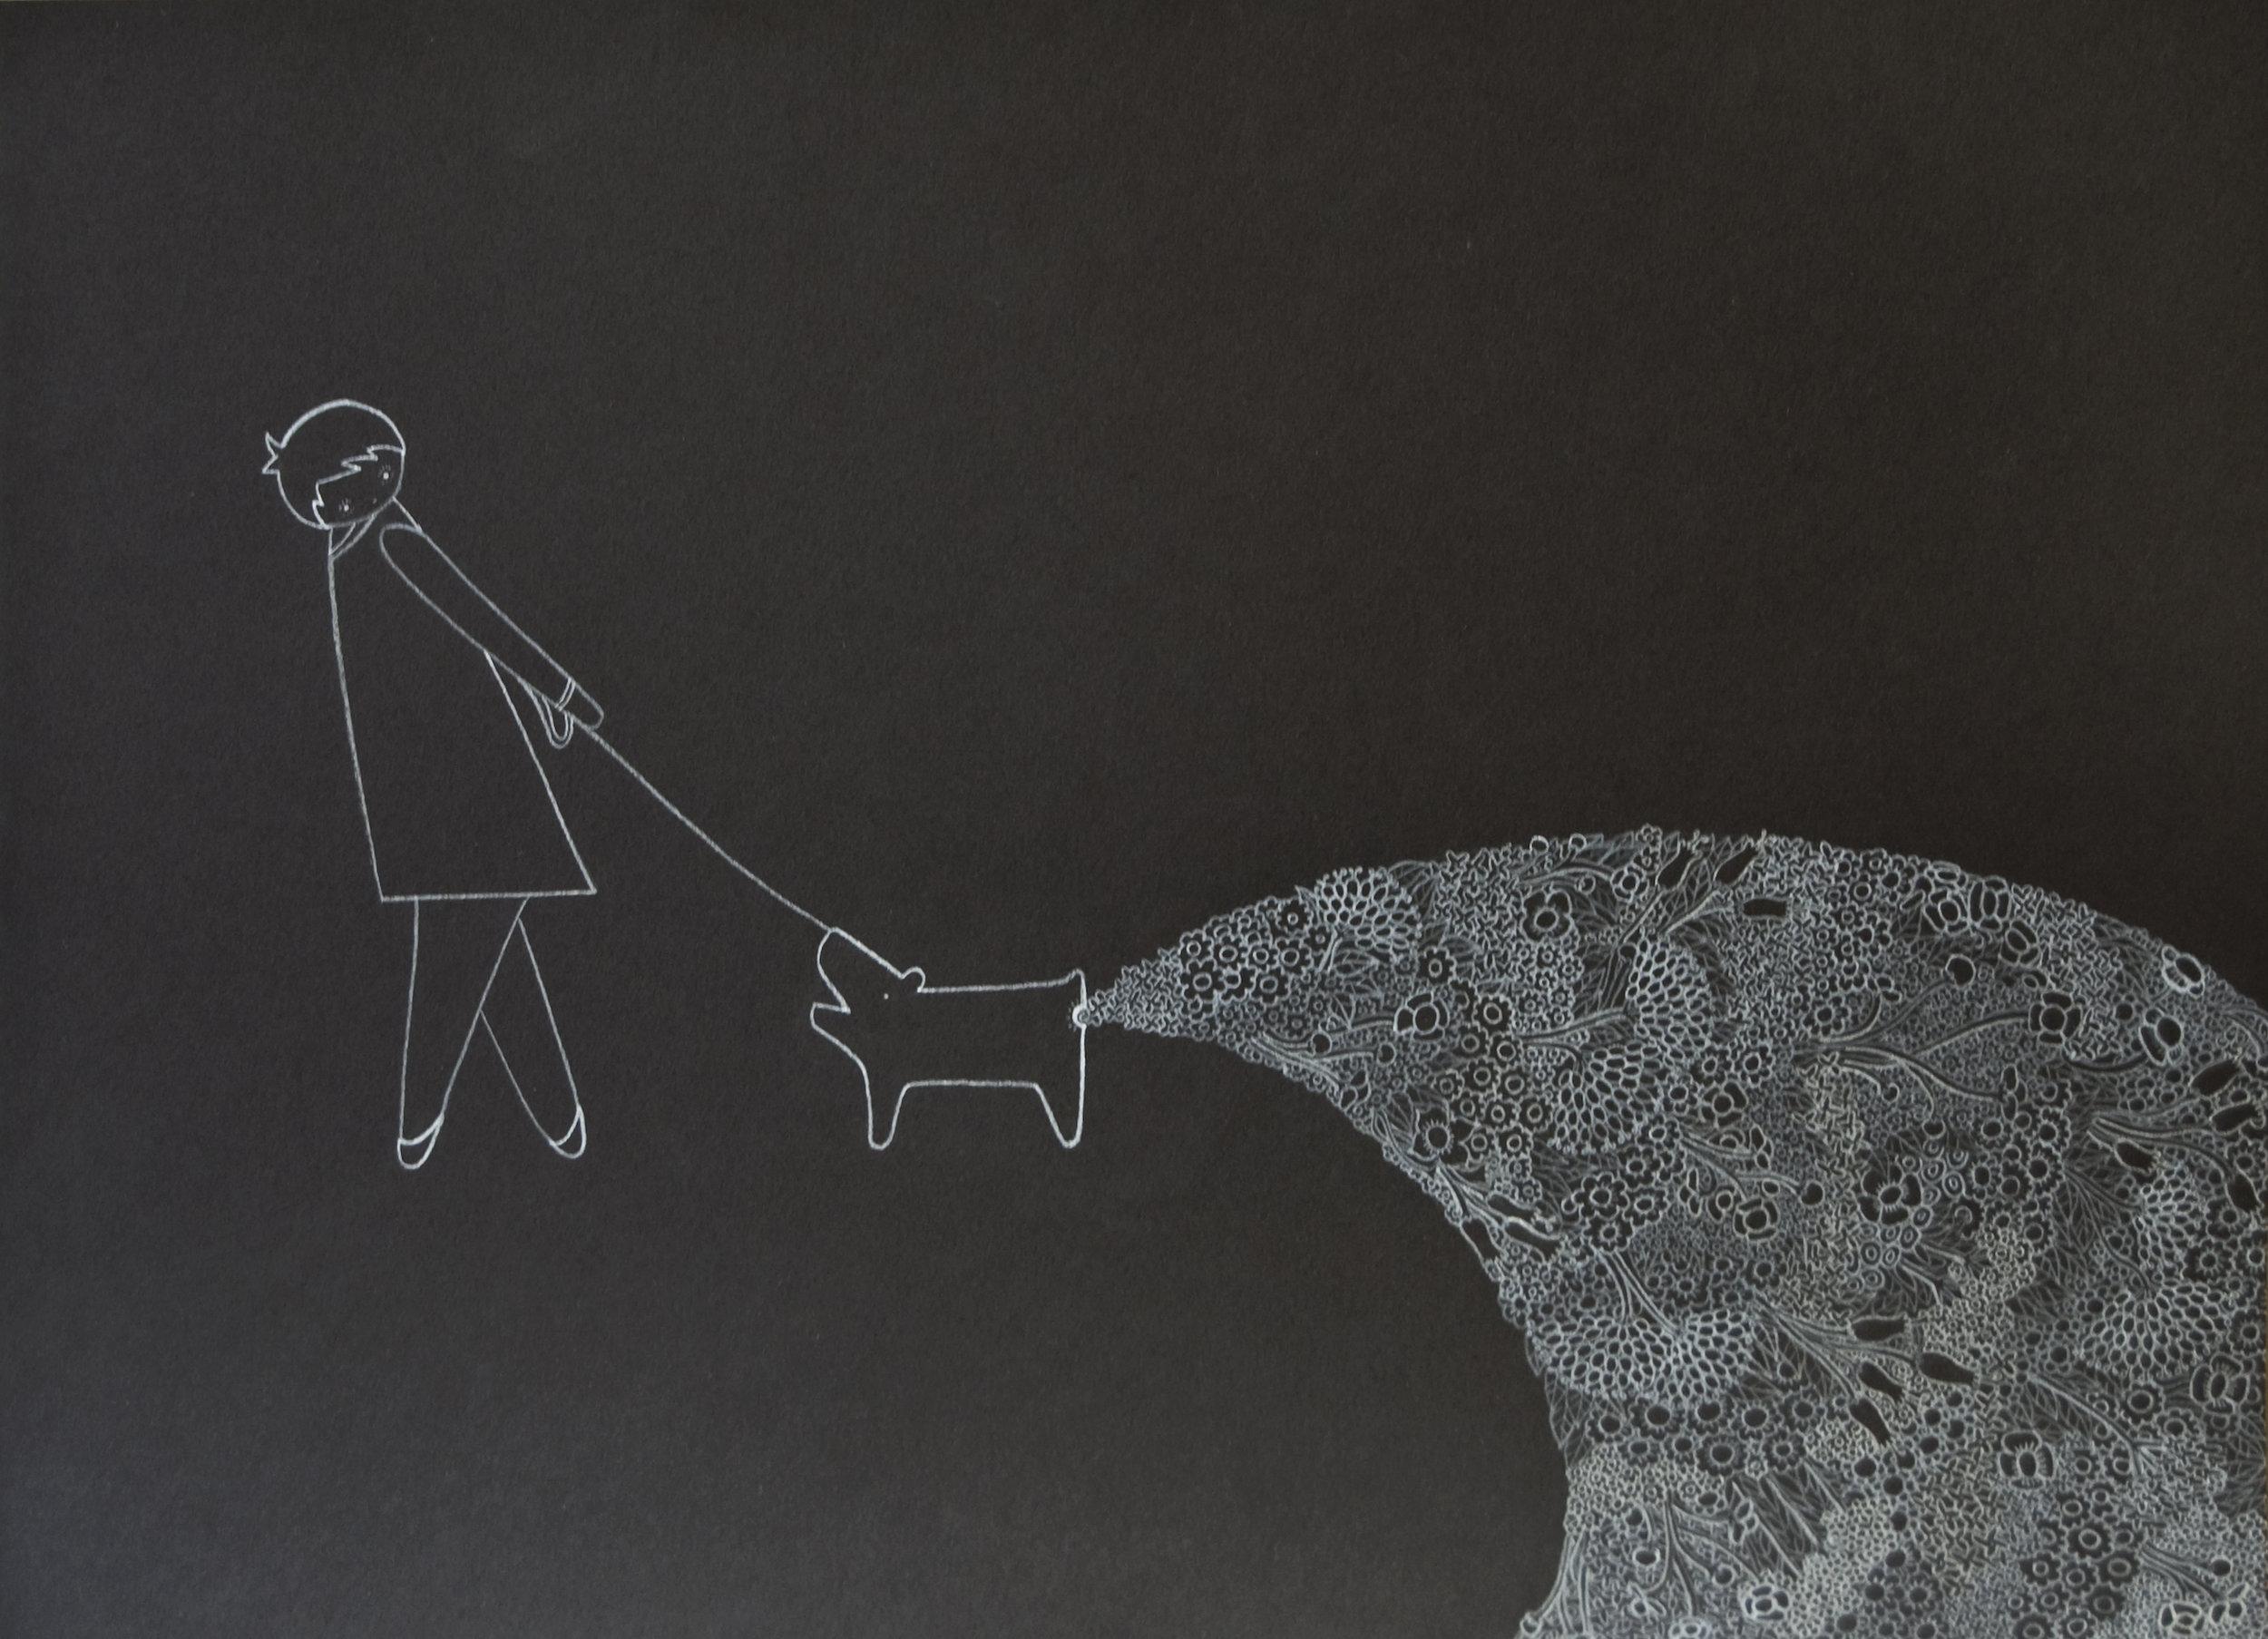 Untitled (Dog defecating Flowers)